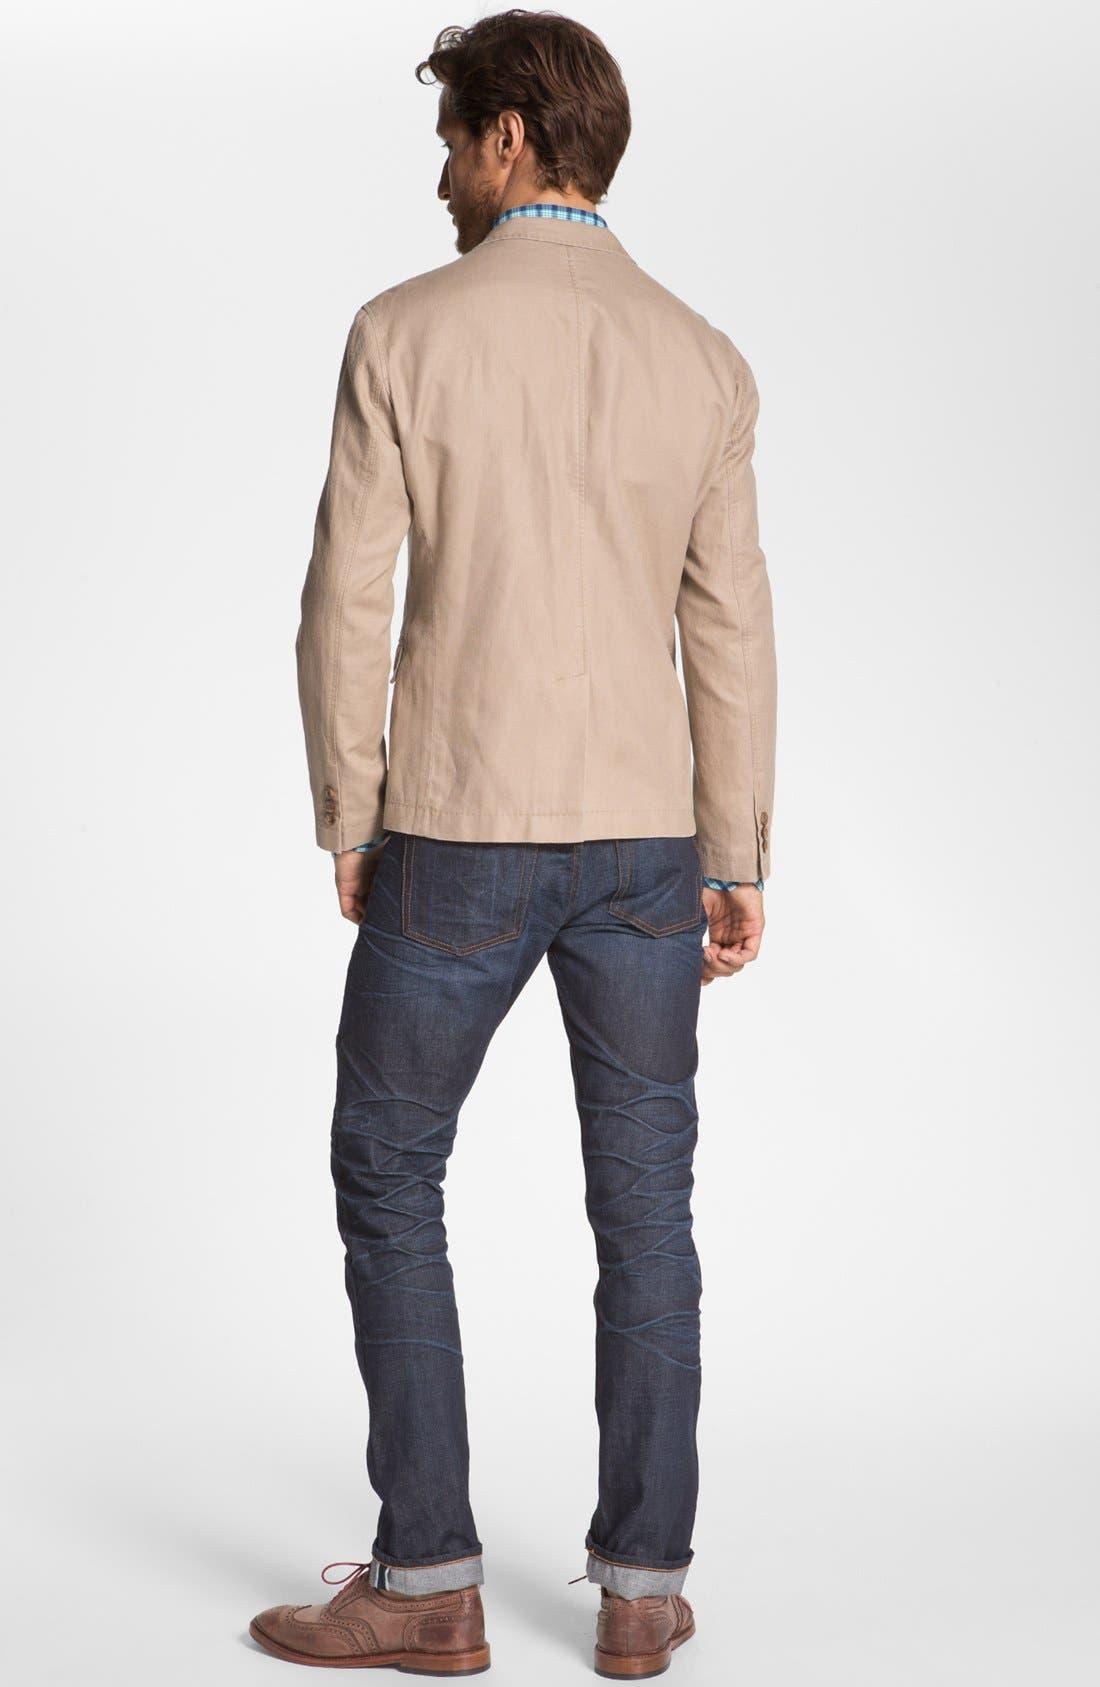 ASBURY PARK,                             '1888 Skinny Fit' Raw Selvedge Jeans,                             Alternate thumbnail 4, color,                             401